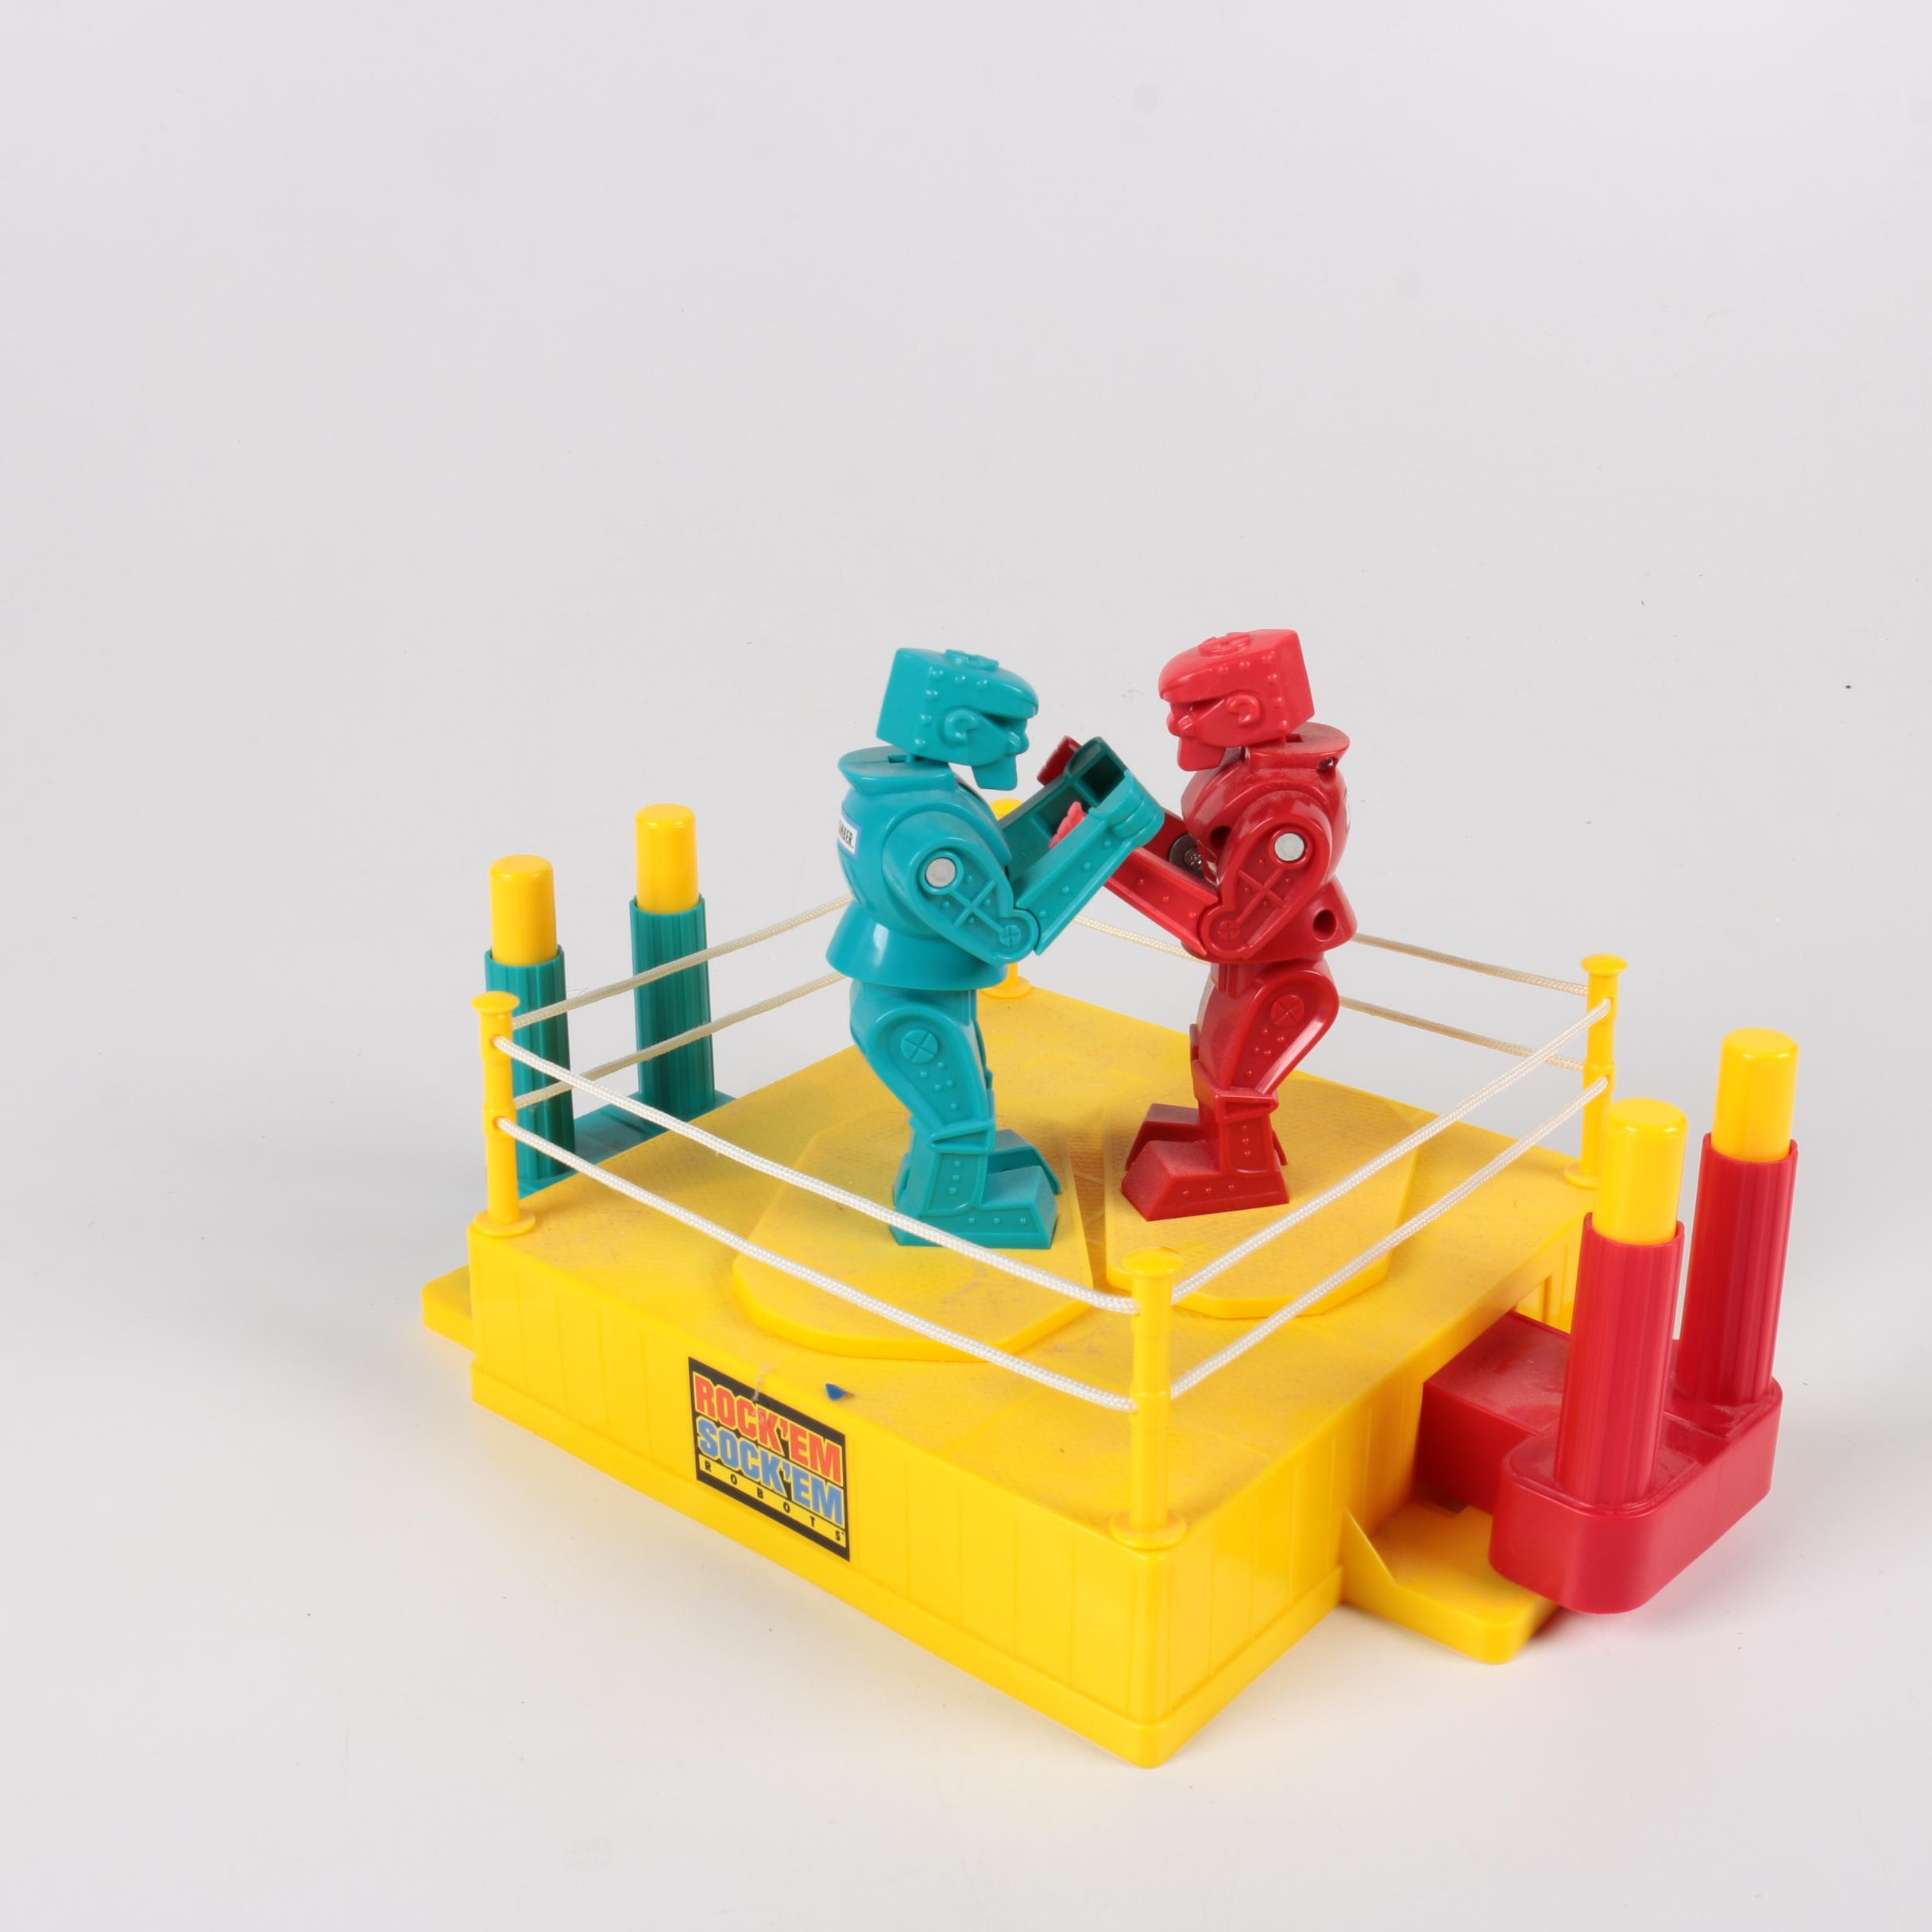 Rock 'Em Sock 'Em Robots Play Set